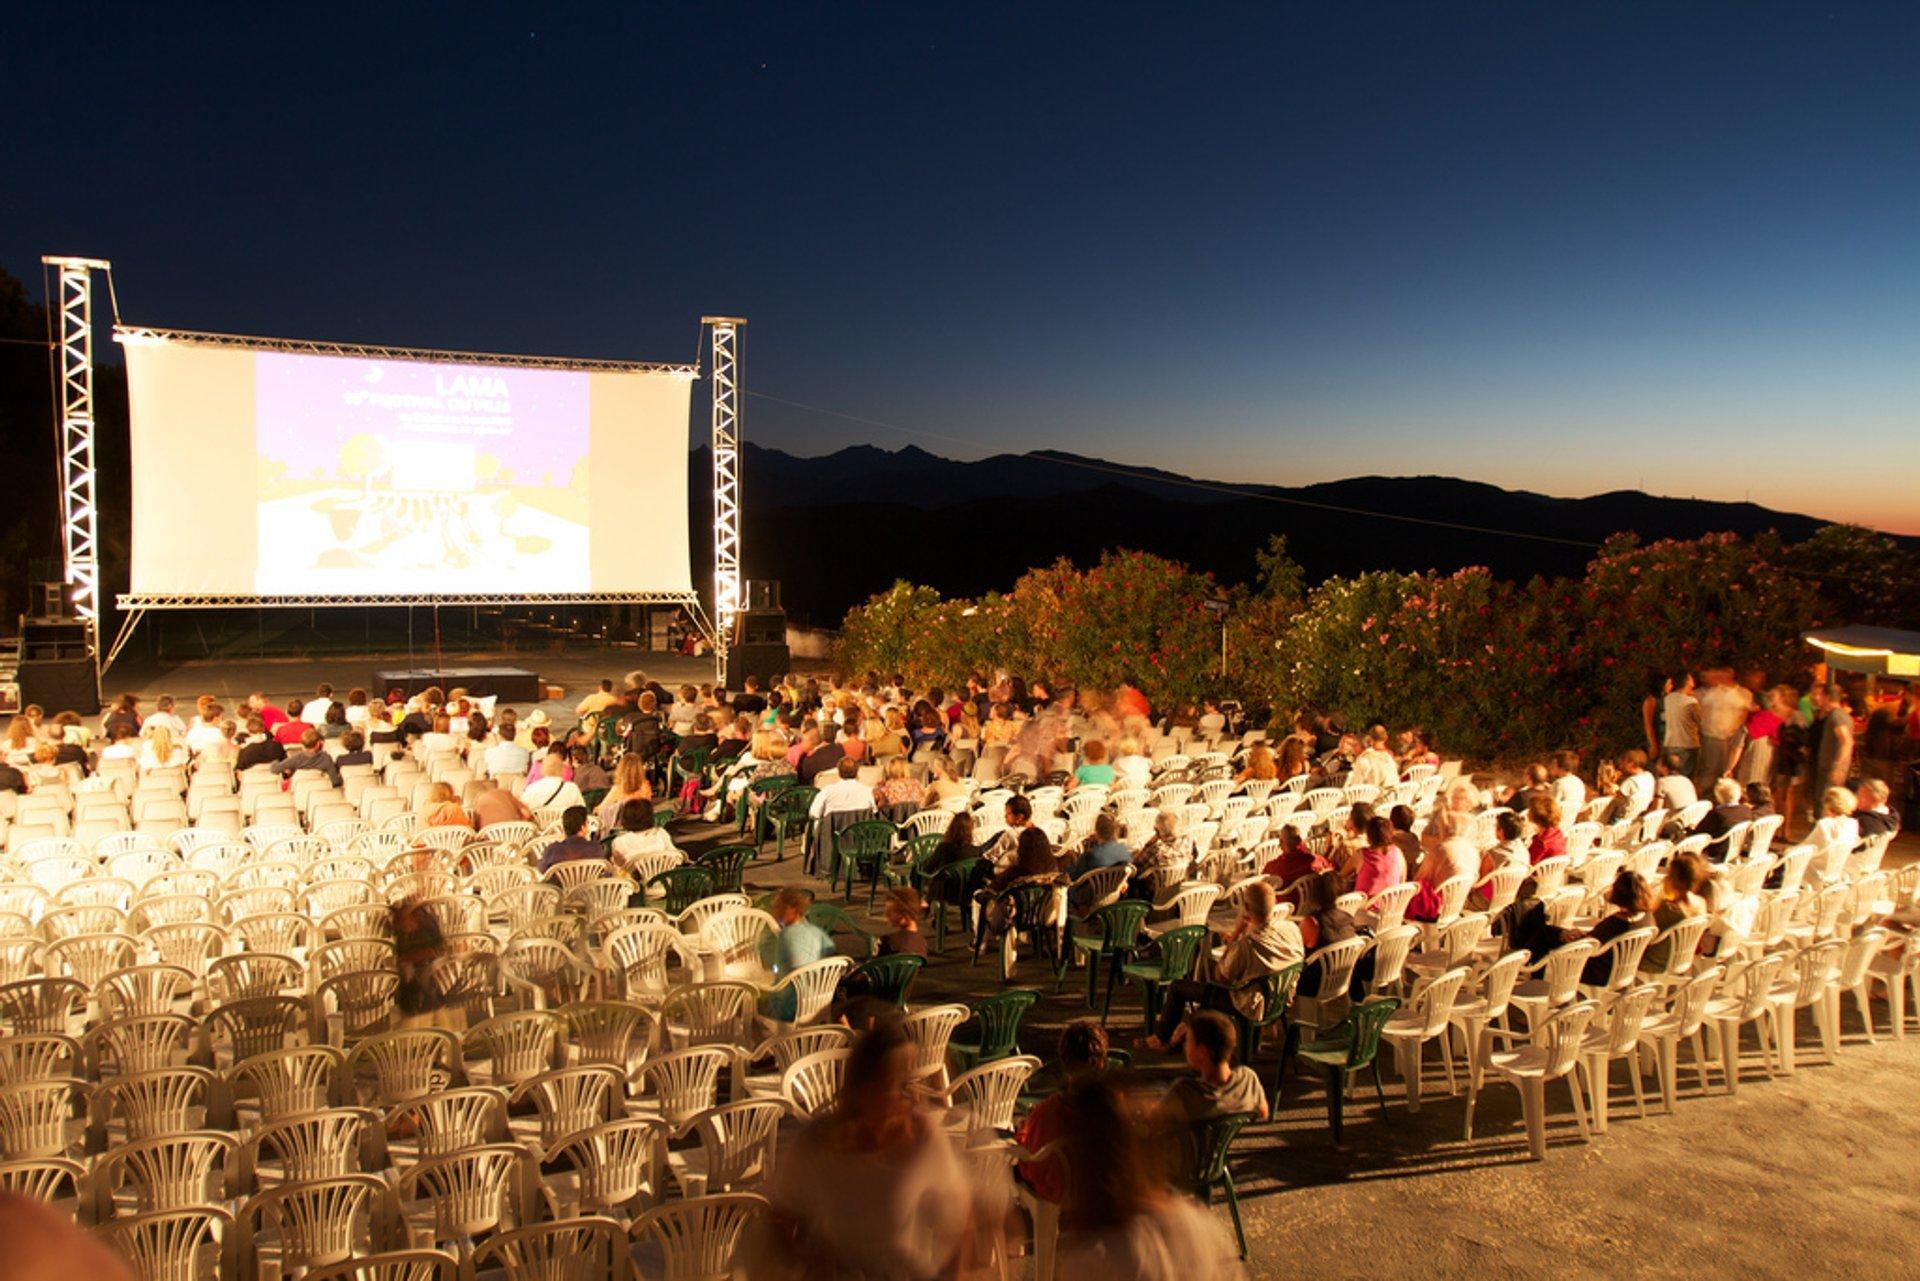 Festival du Film de Lama in Corsica 2020 - Best Time